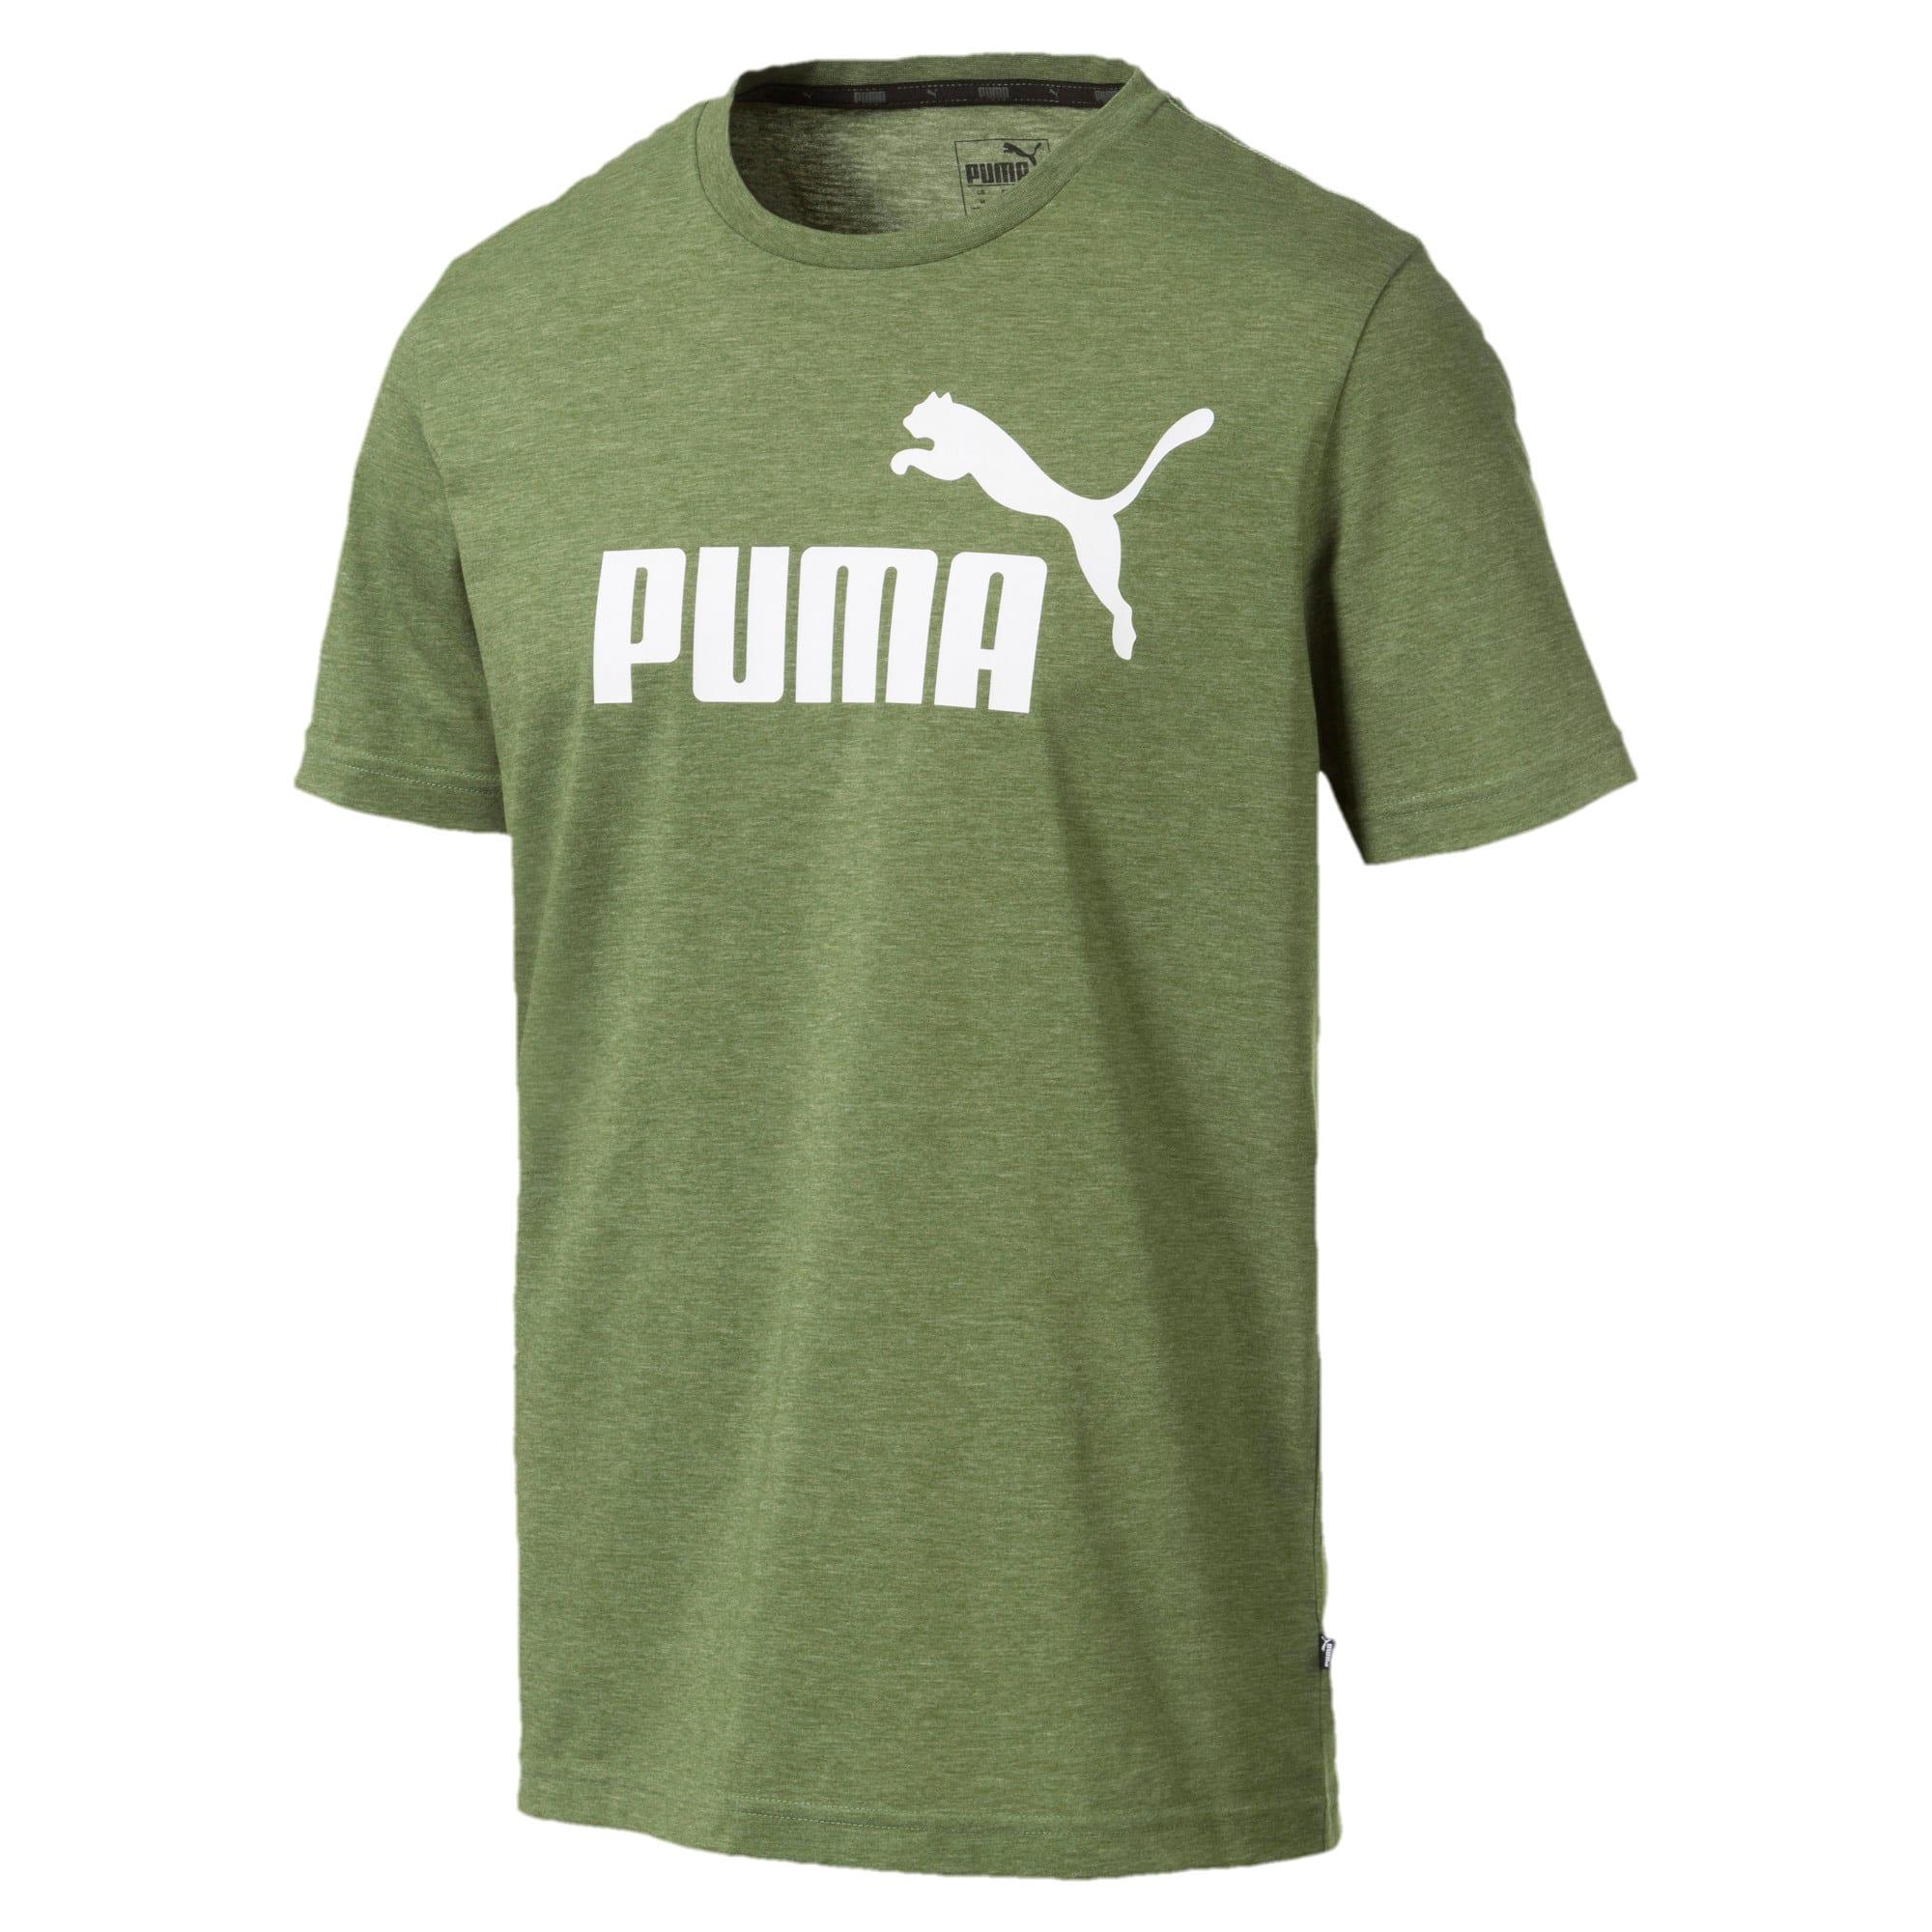 Thumbnail 4 of Indispensabili+ T-shirt mélange uomo, Garden Green Heather, medium